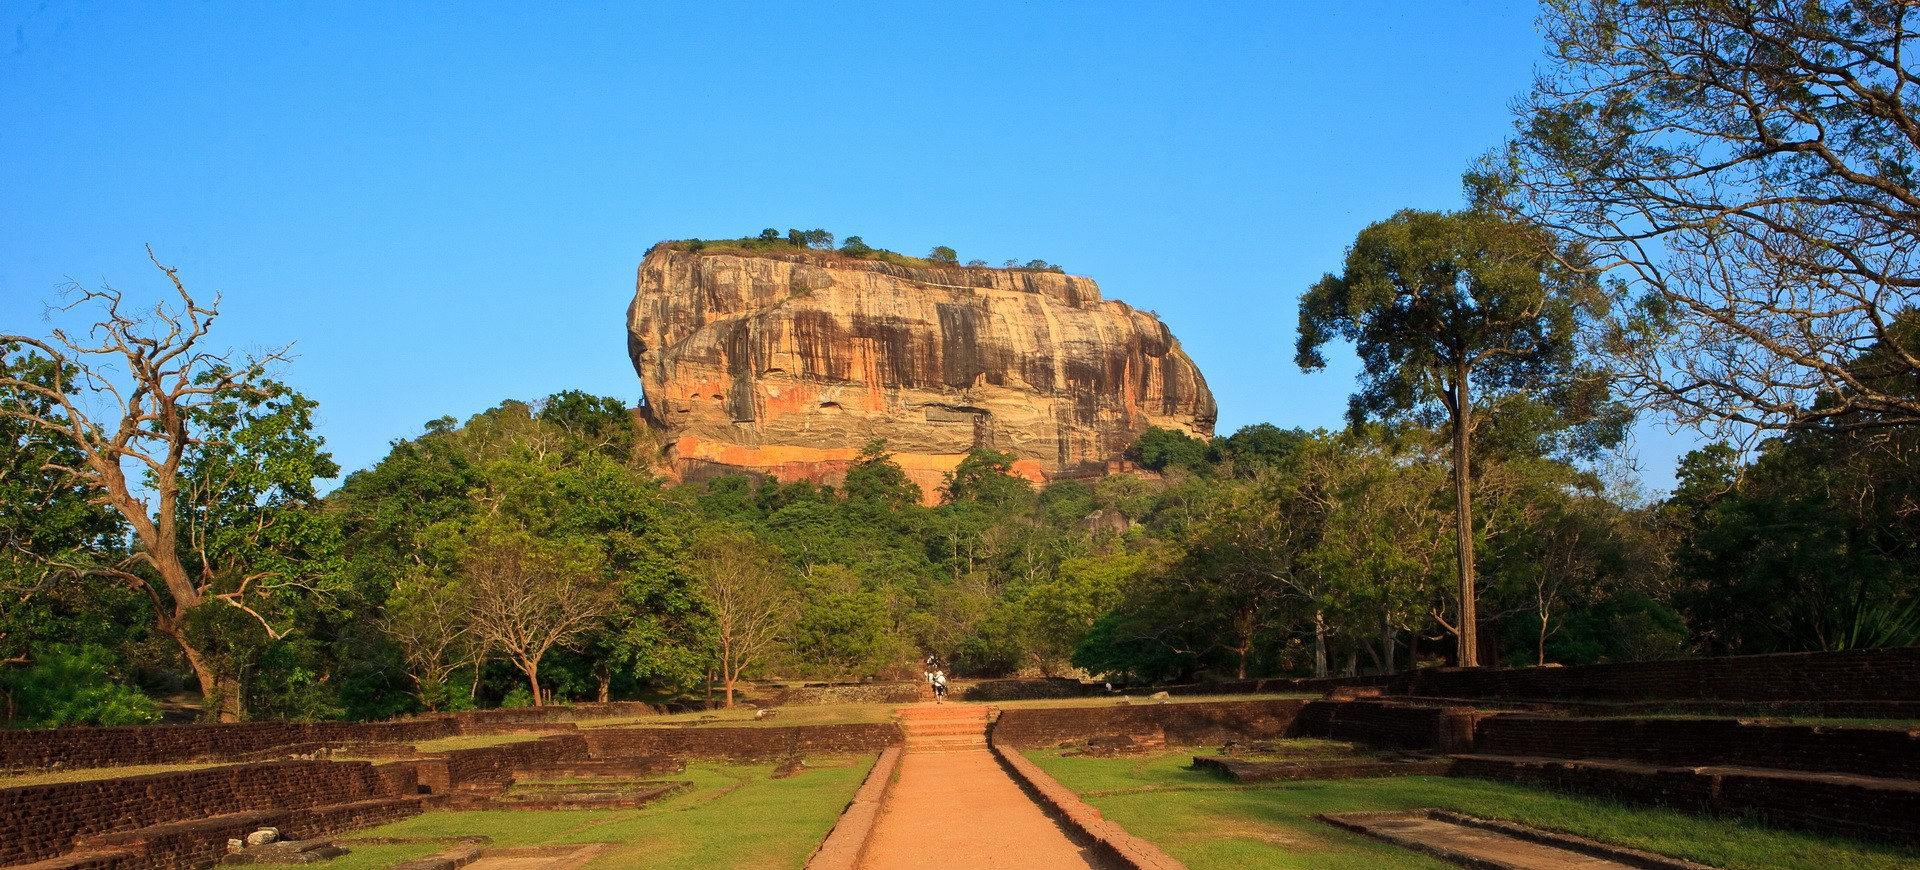 Sri Lanka Sigiriya Le Rocher Sacré